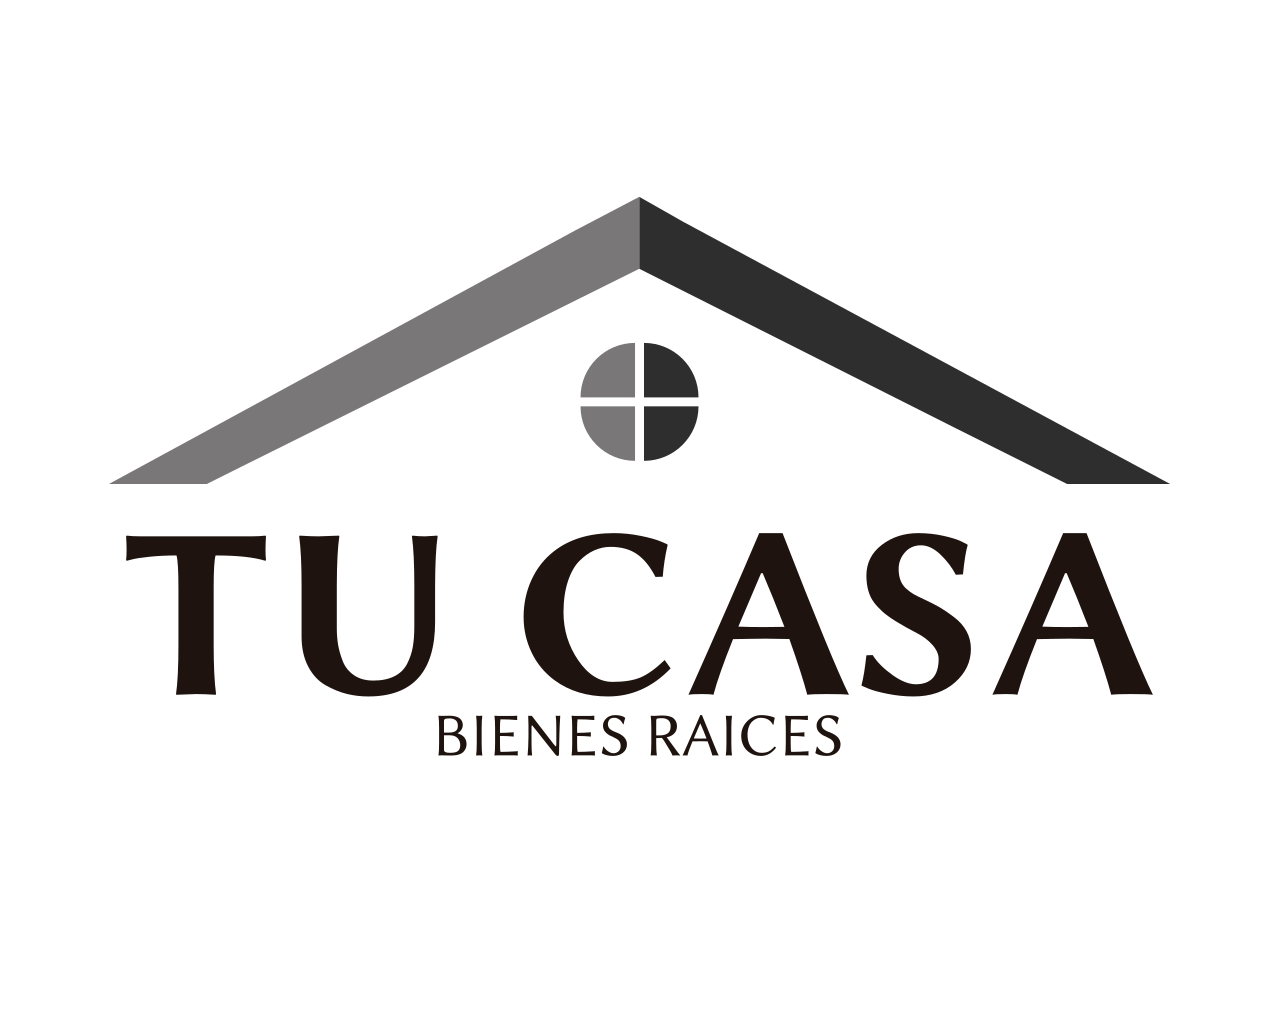 LOGOTIPO_TUCASA_PNG.png